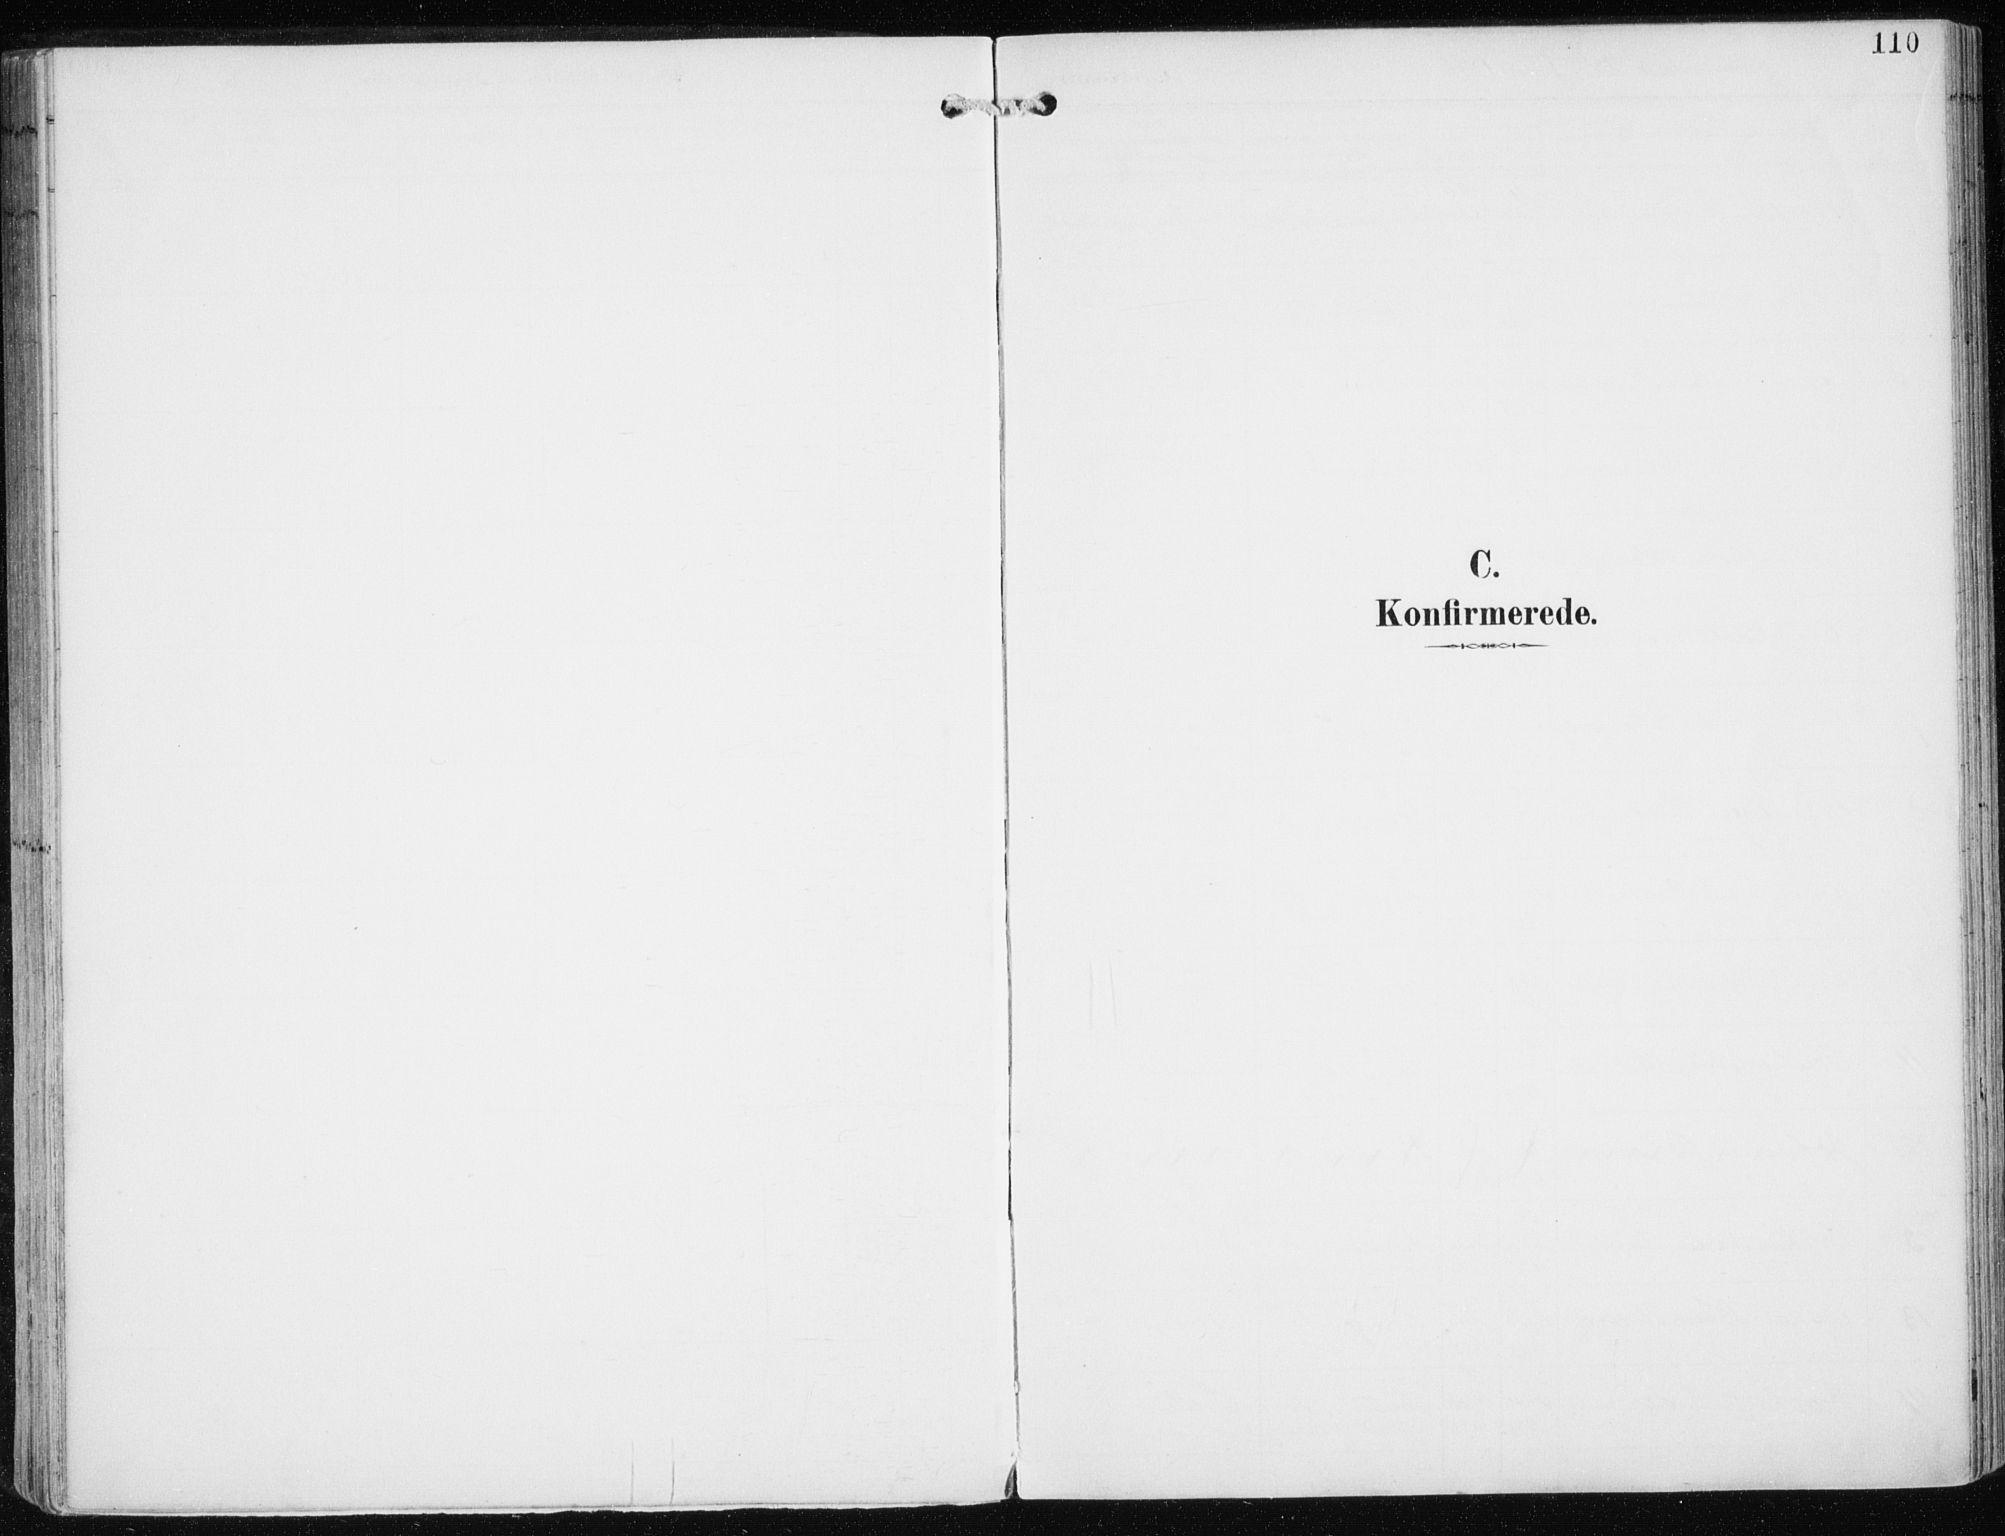 SATØ, Skjervøy sokneprestkontor, H/Ha/Haa/L0017kirke: Ministerialbok nr. 17, 1895-1911, s. 110